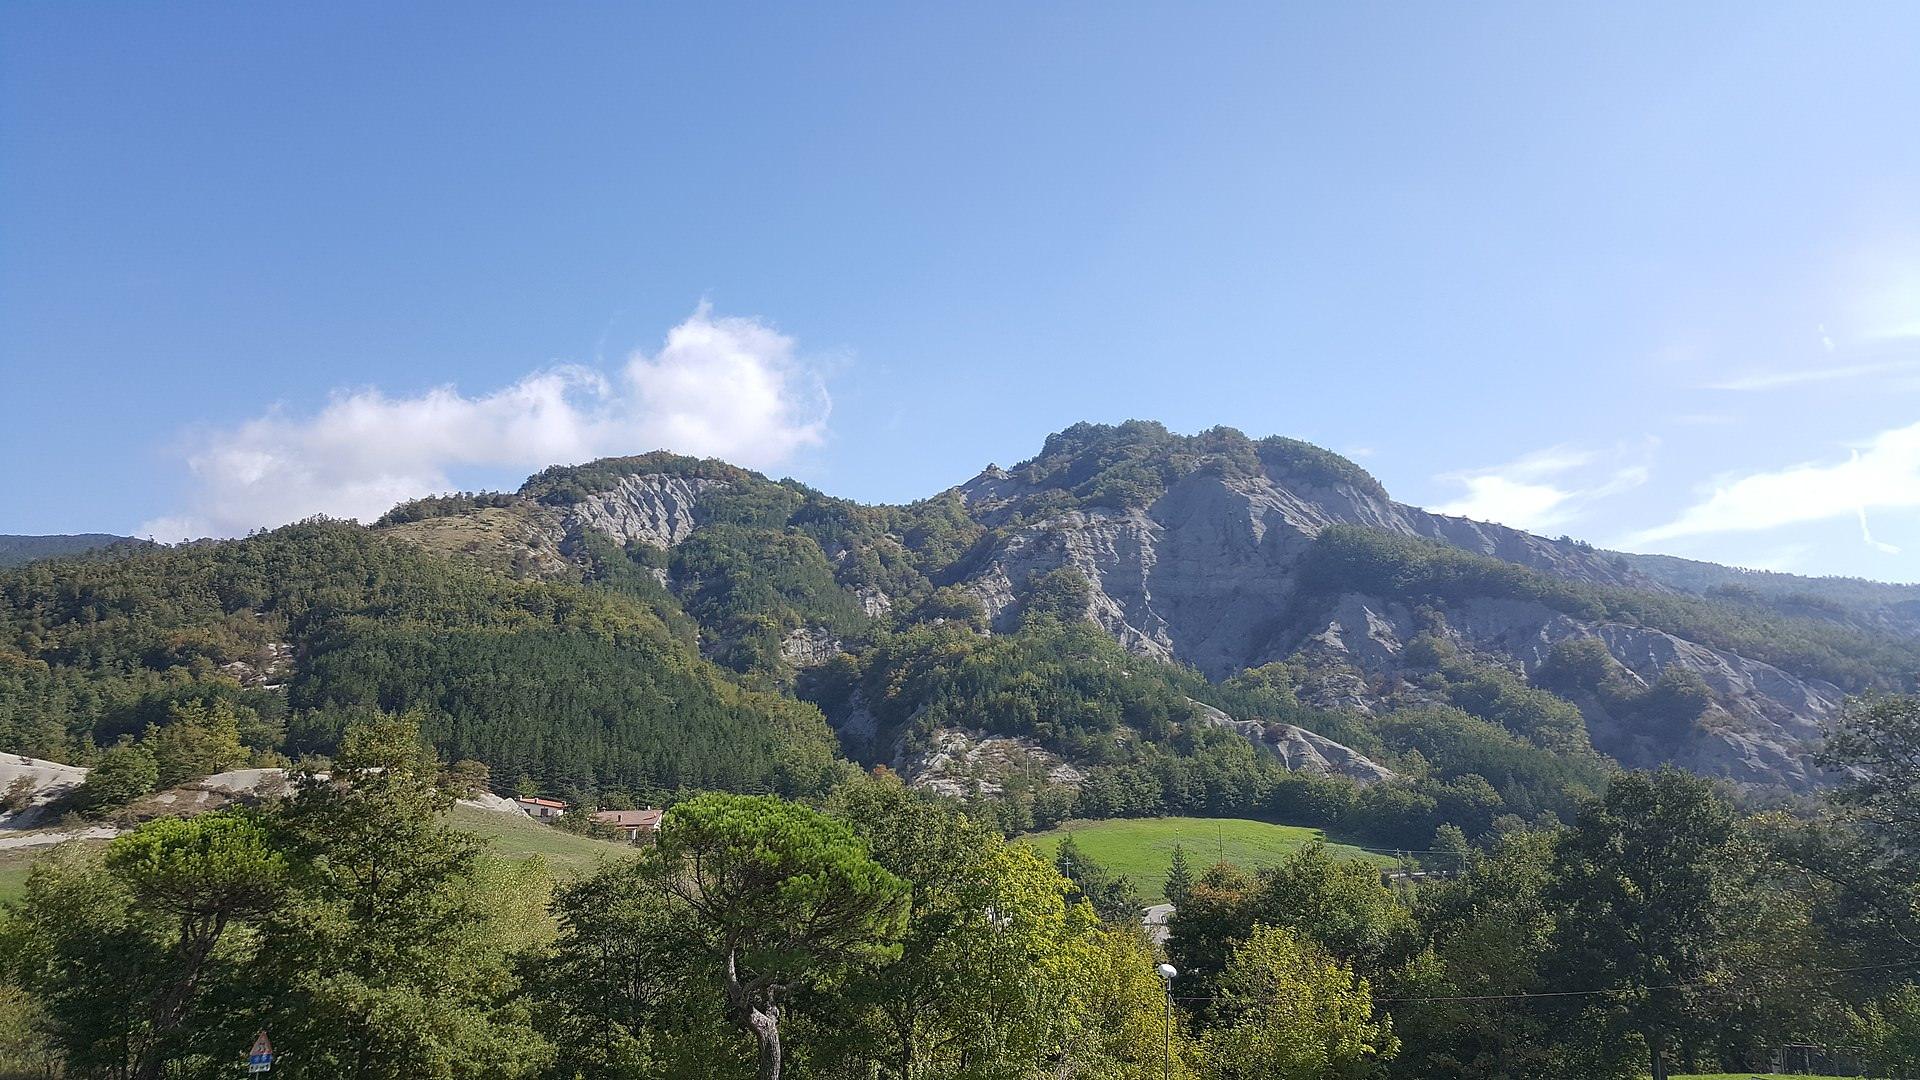 Monte Fumaiolo, Montione